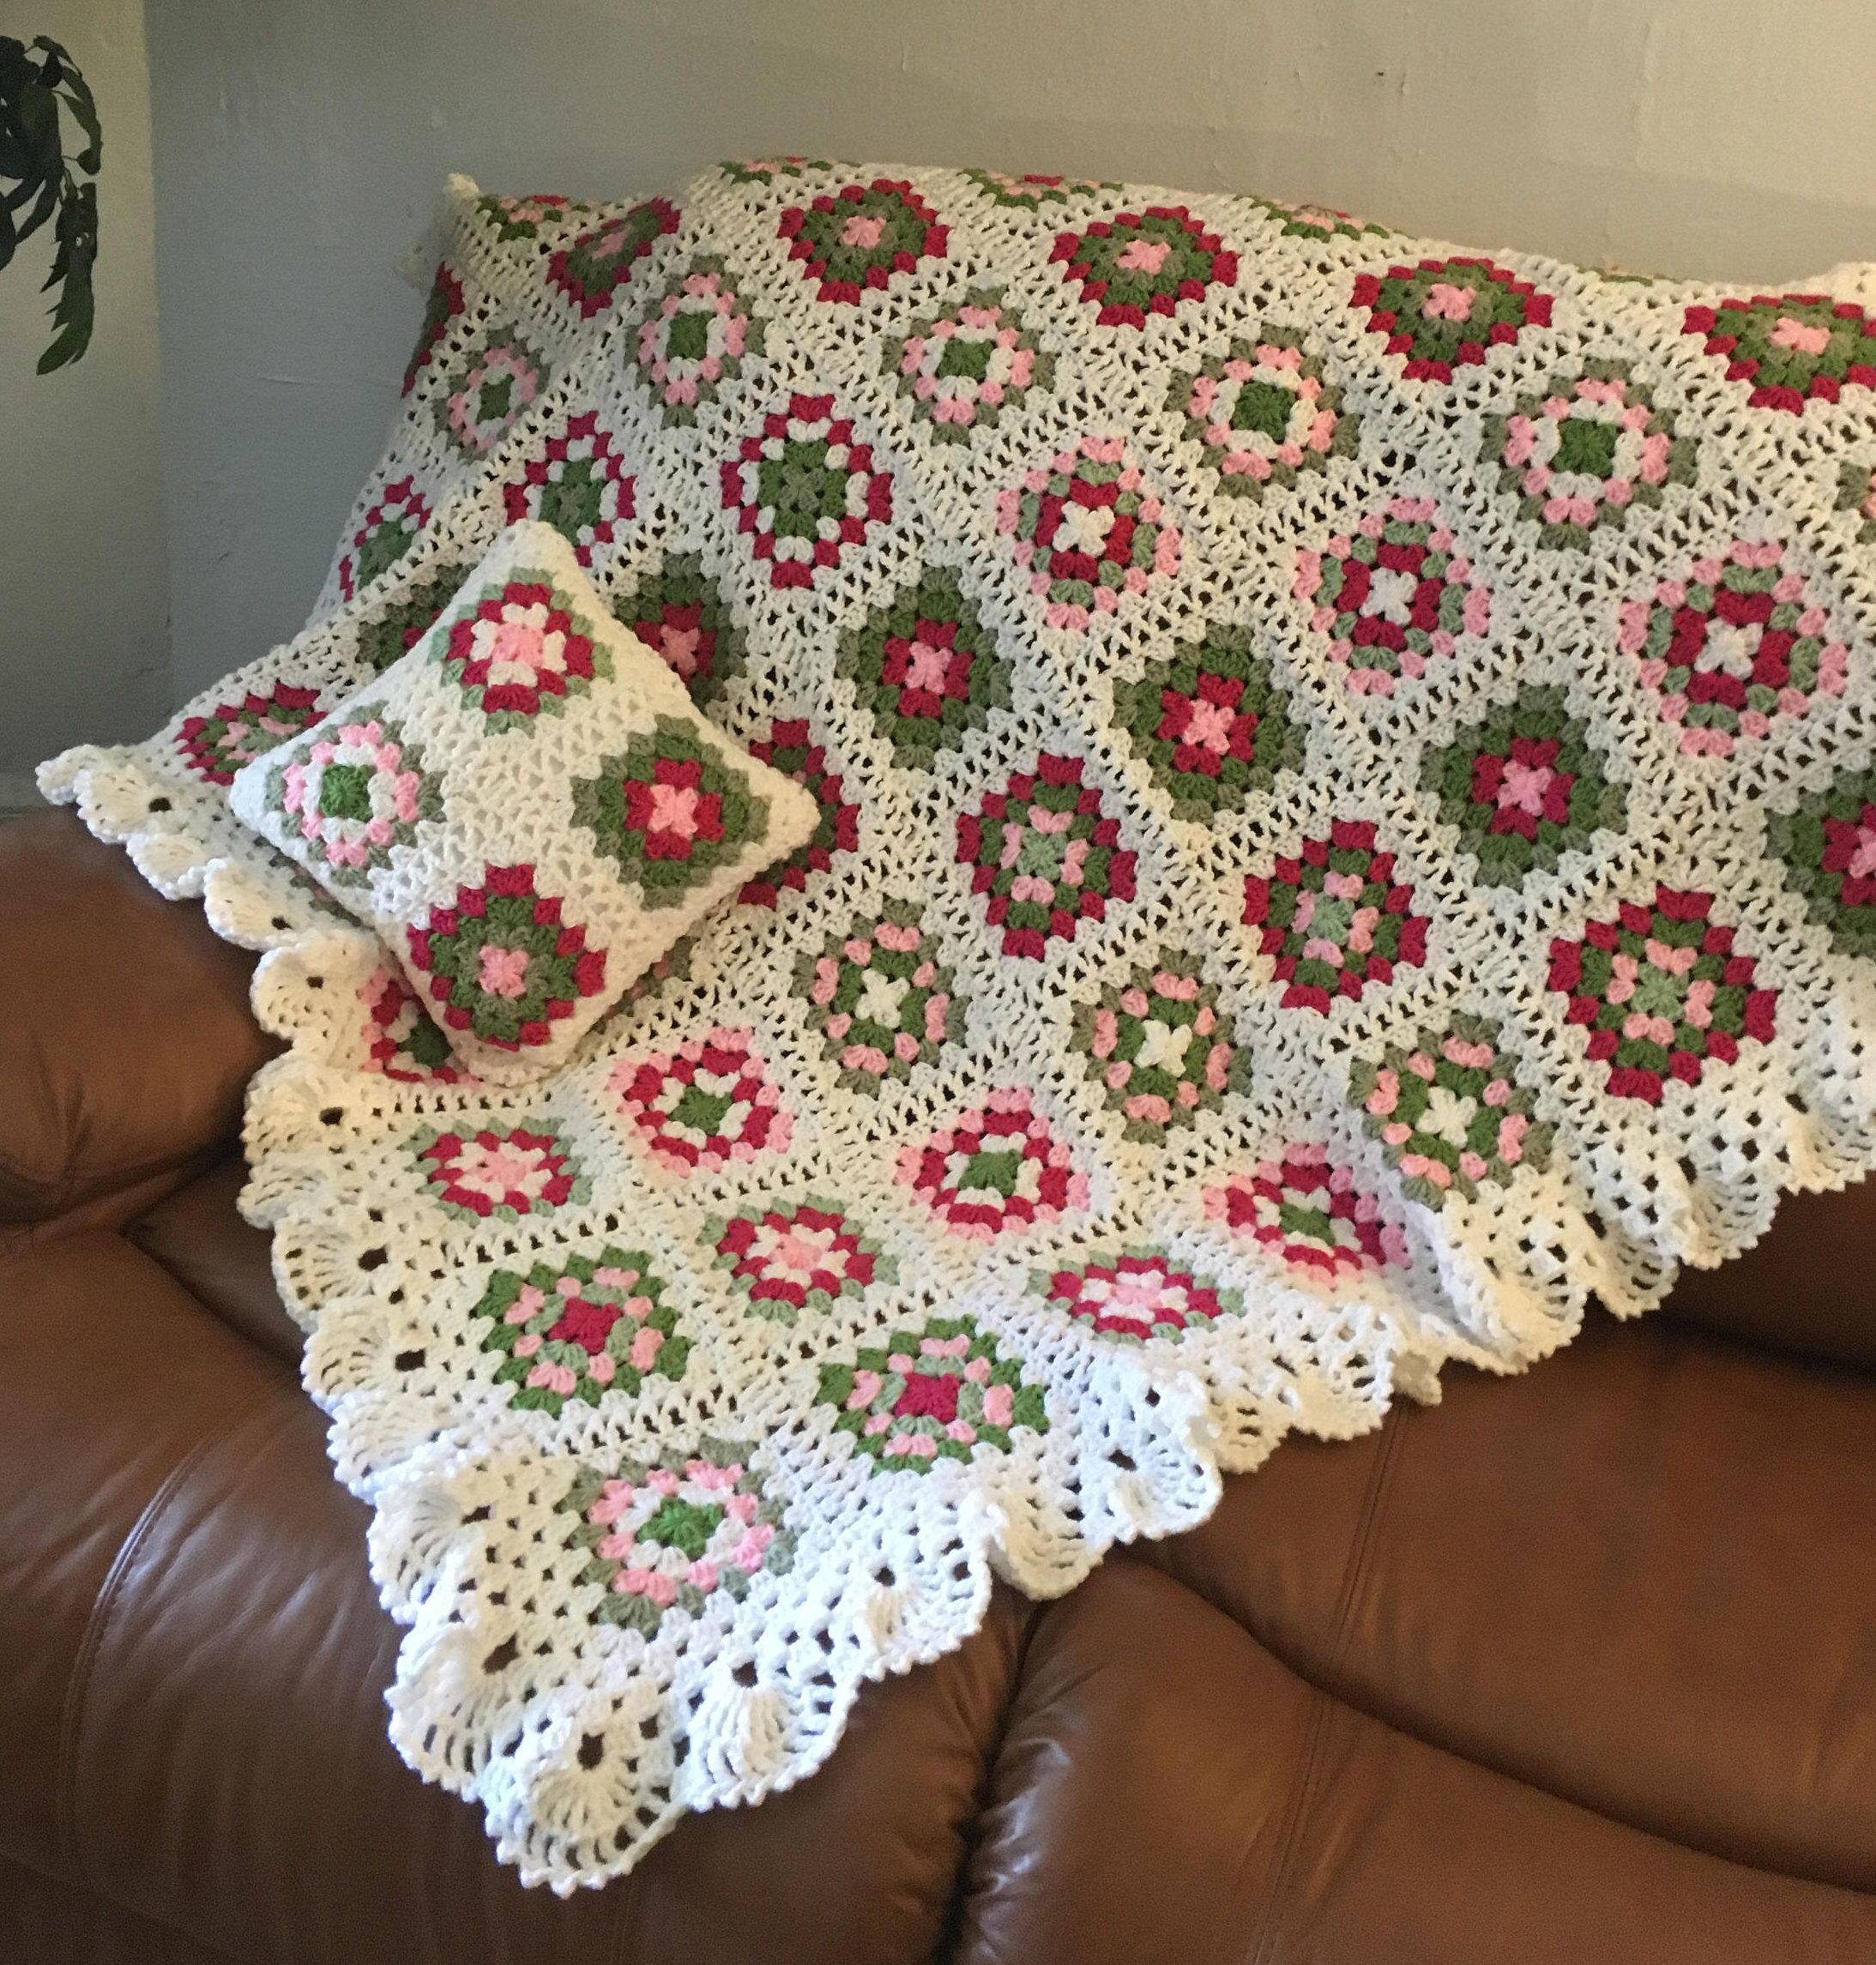 Pin de ༺✿༻Lorri Beth༺✿༻ en Crochet Ideas | Pinterest | Mosaicos